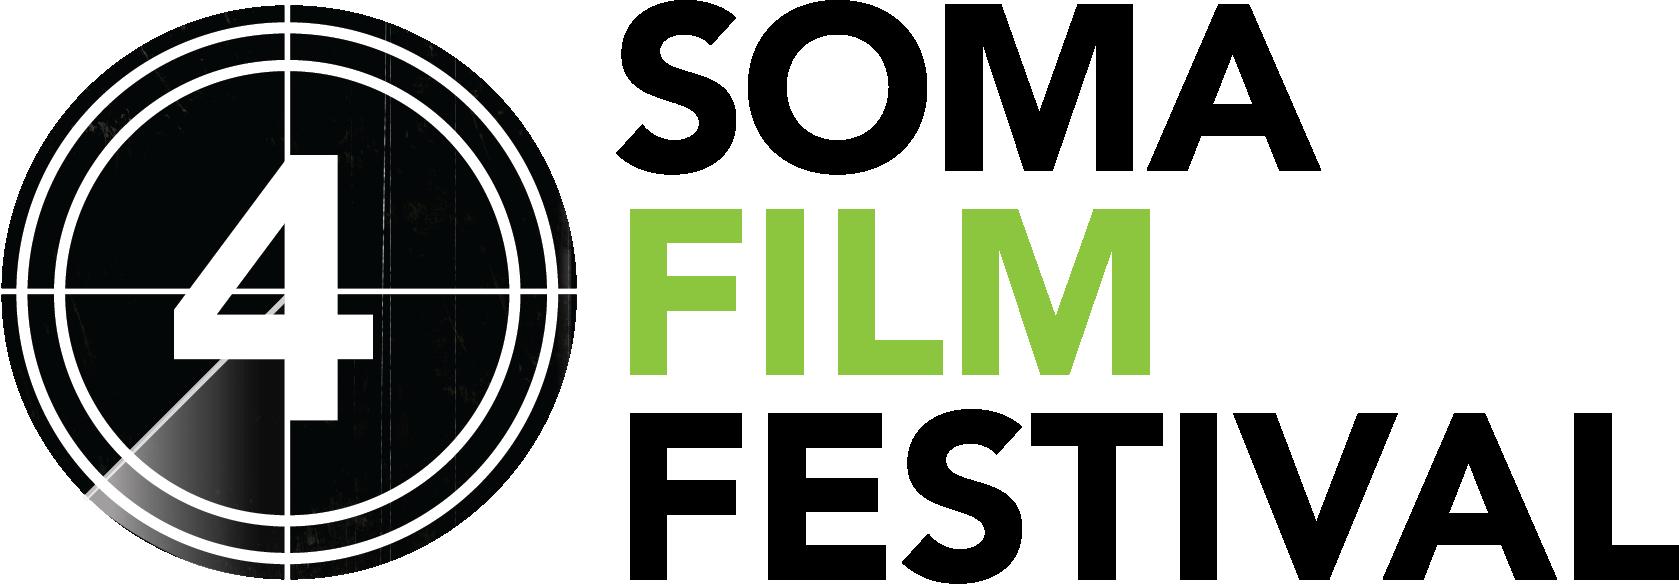 SOMA_FF4_logo